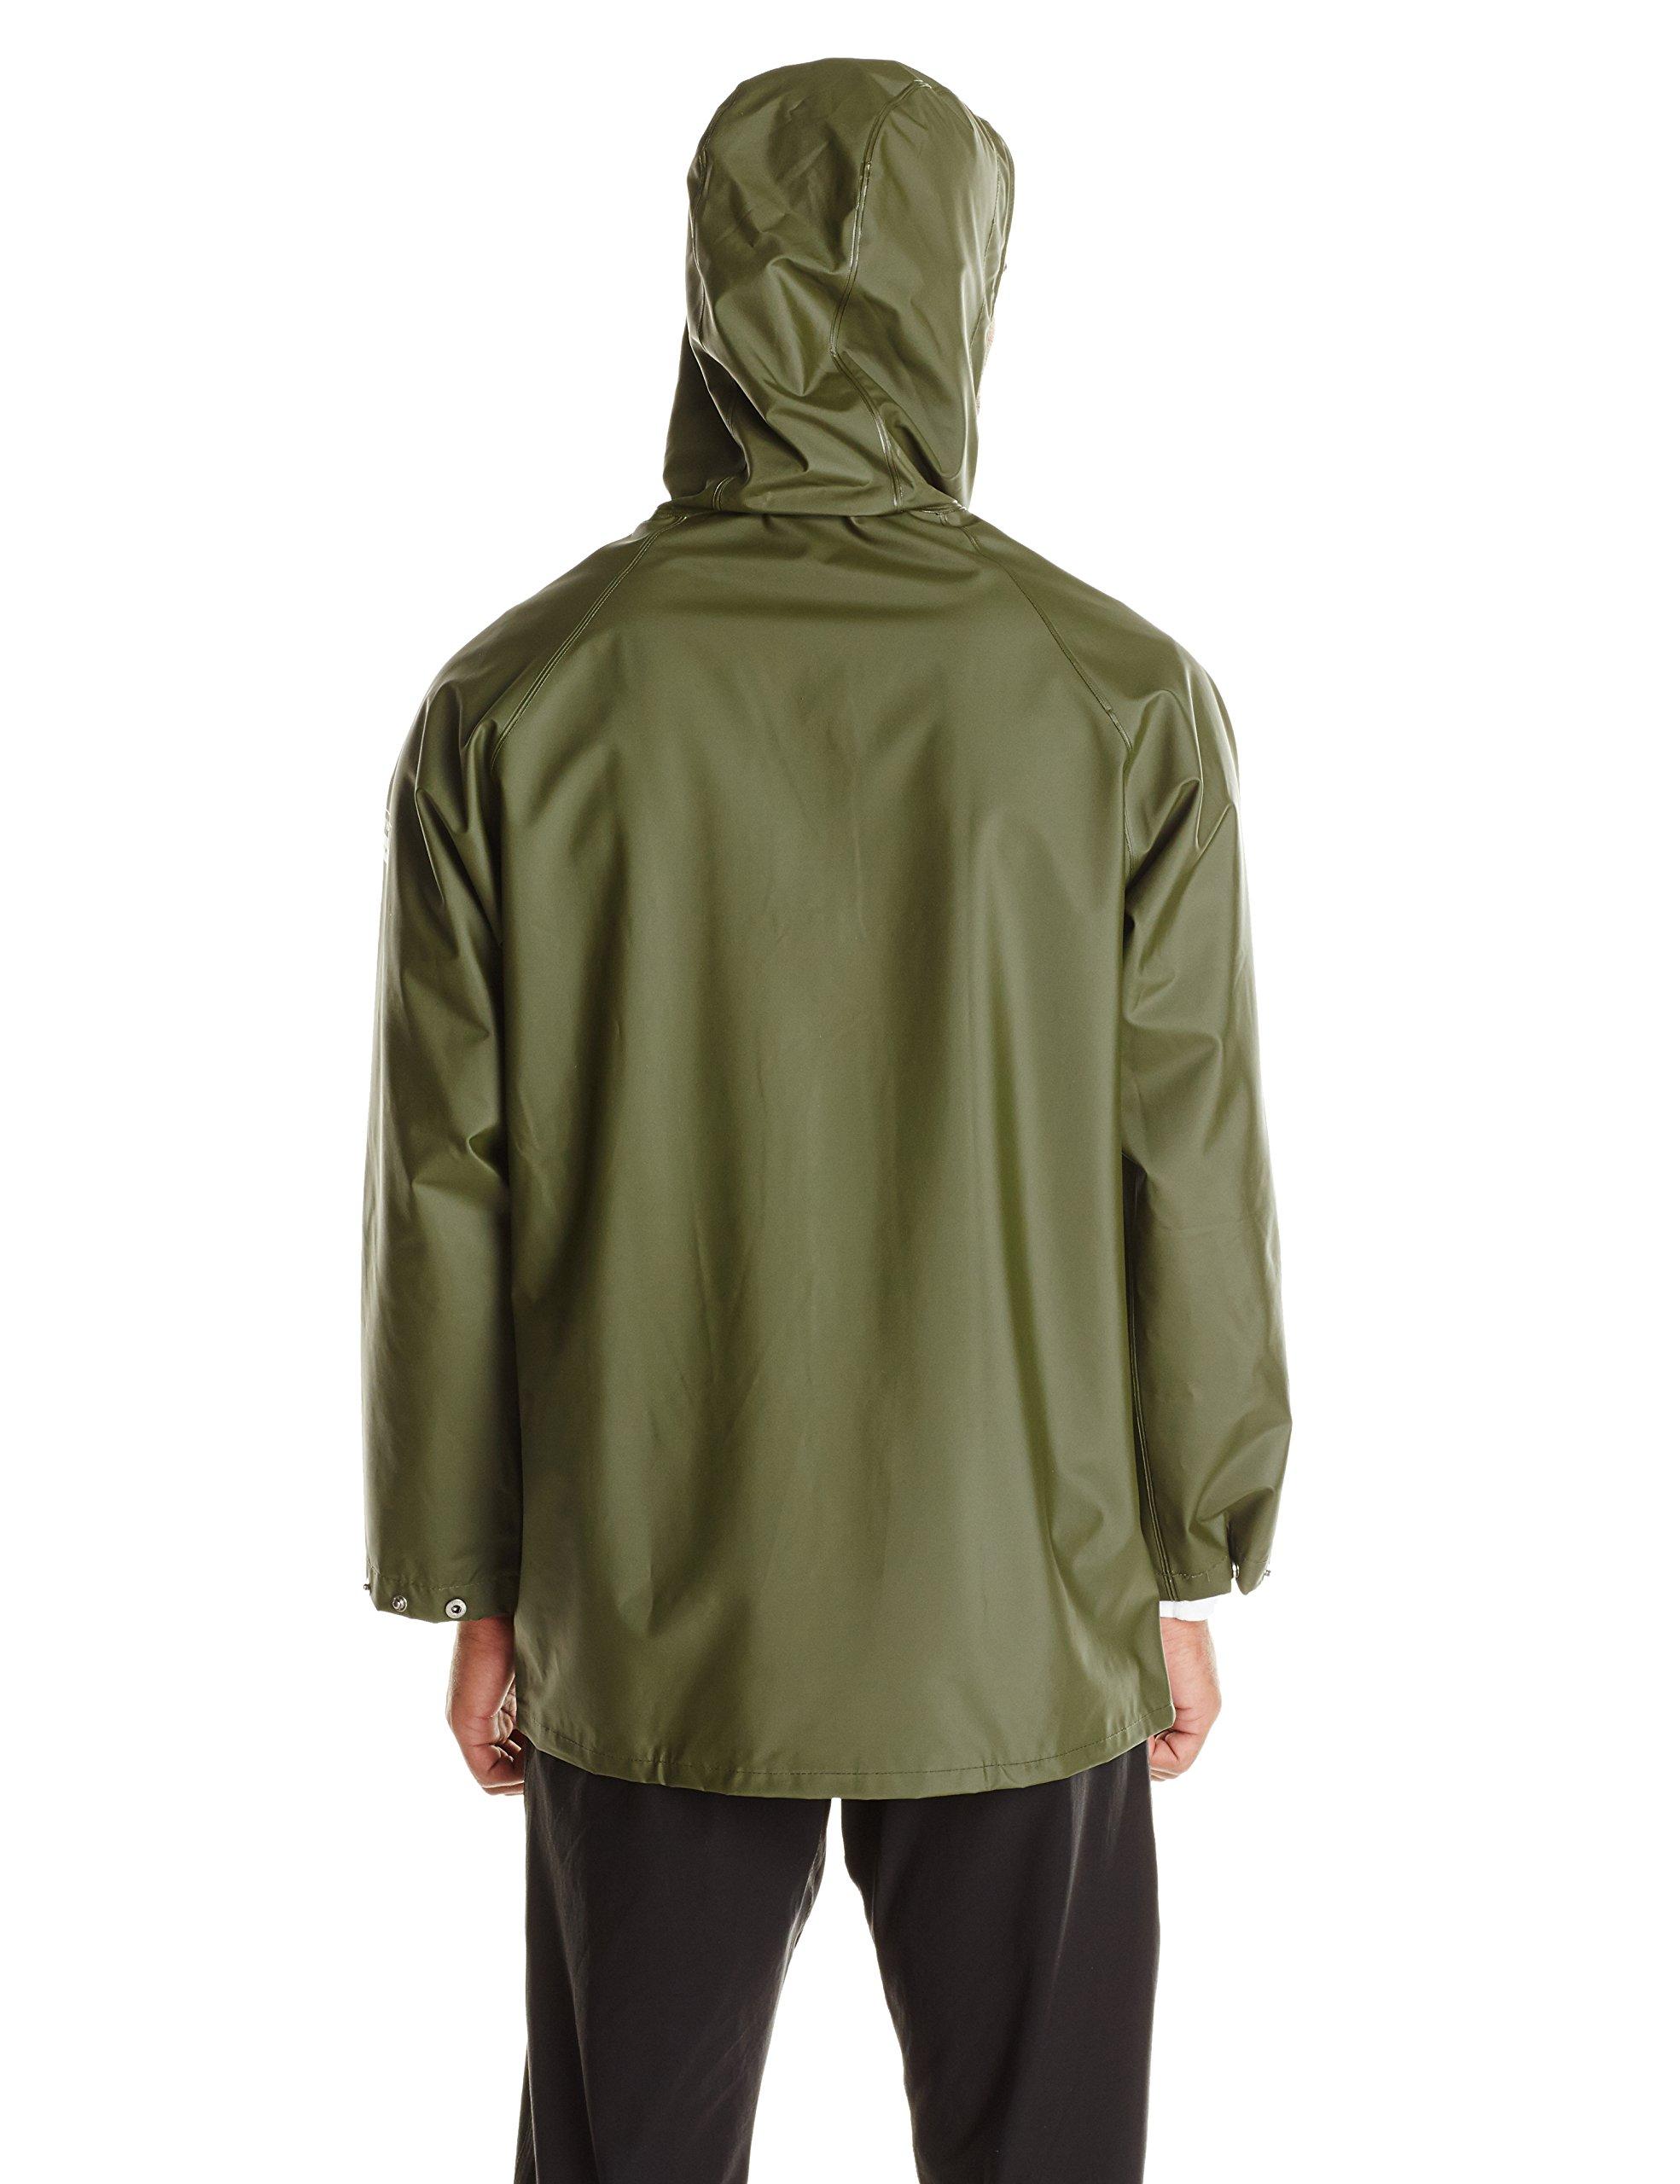 Helly Hansen Workwear Men's Mandal Rain Jacket, Army Green, 4X-Large by Helly Hansen (Image #2)